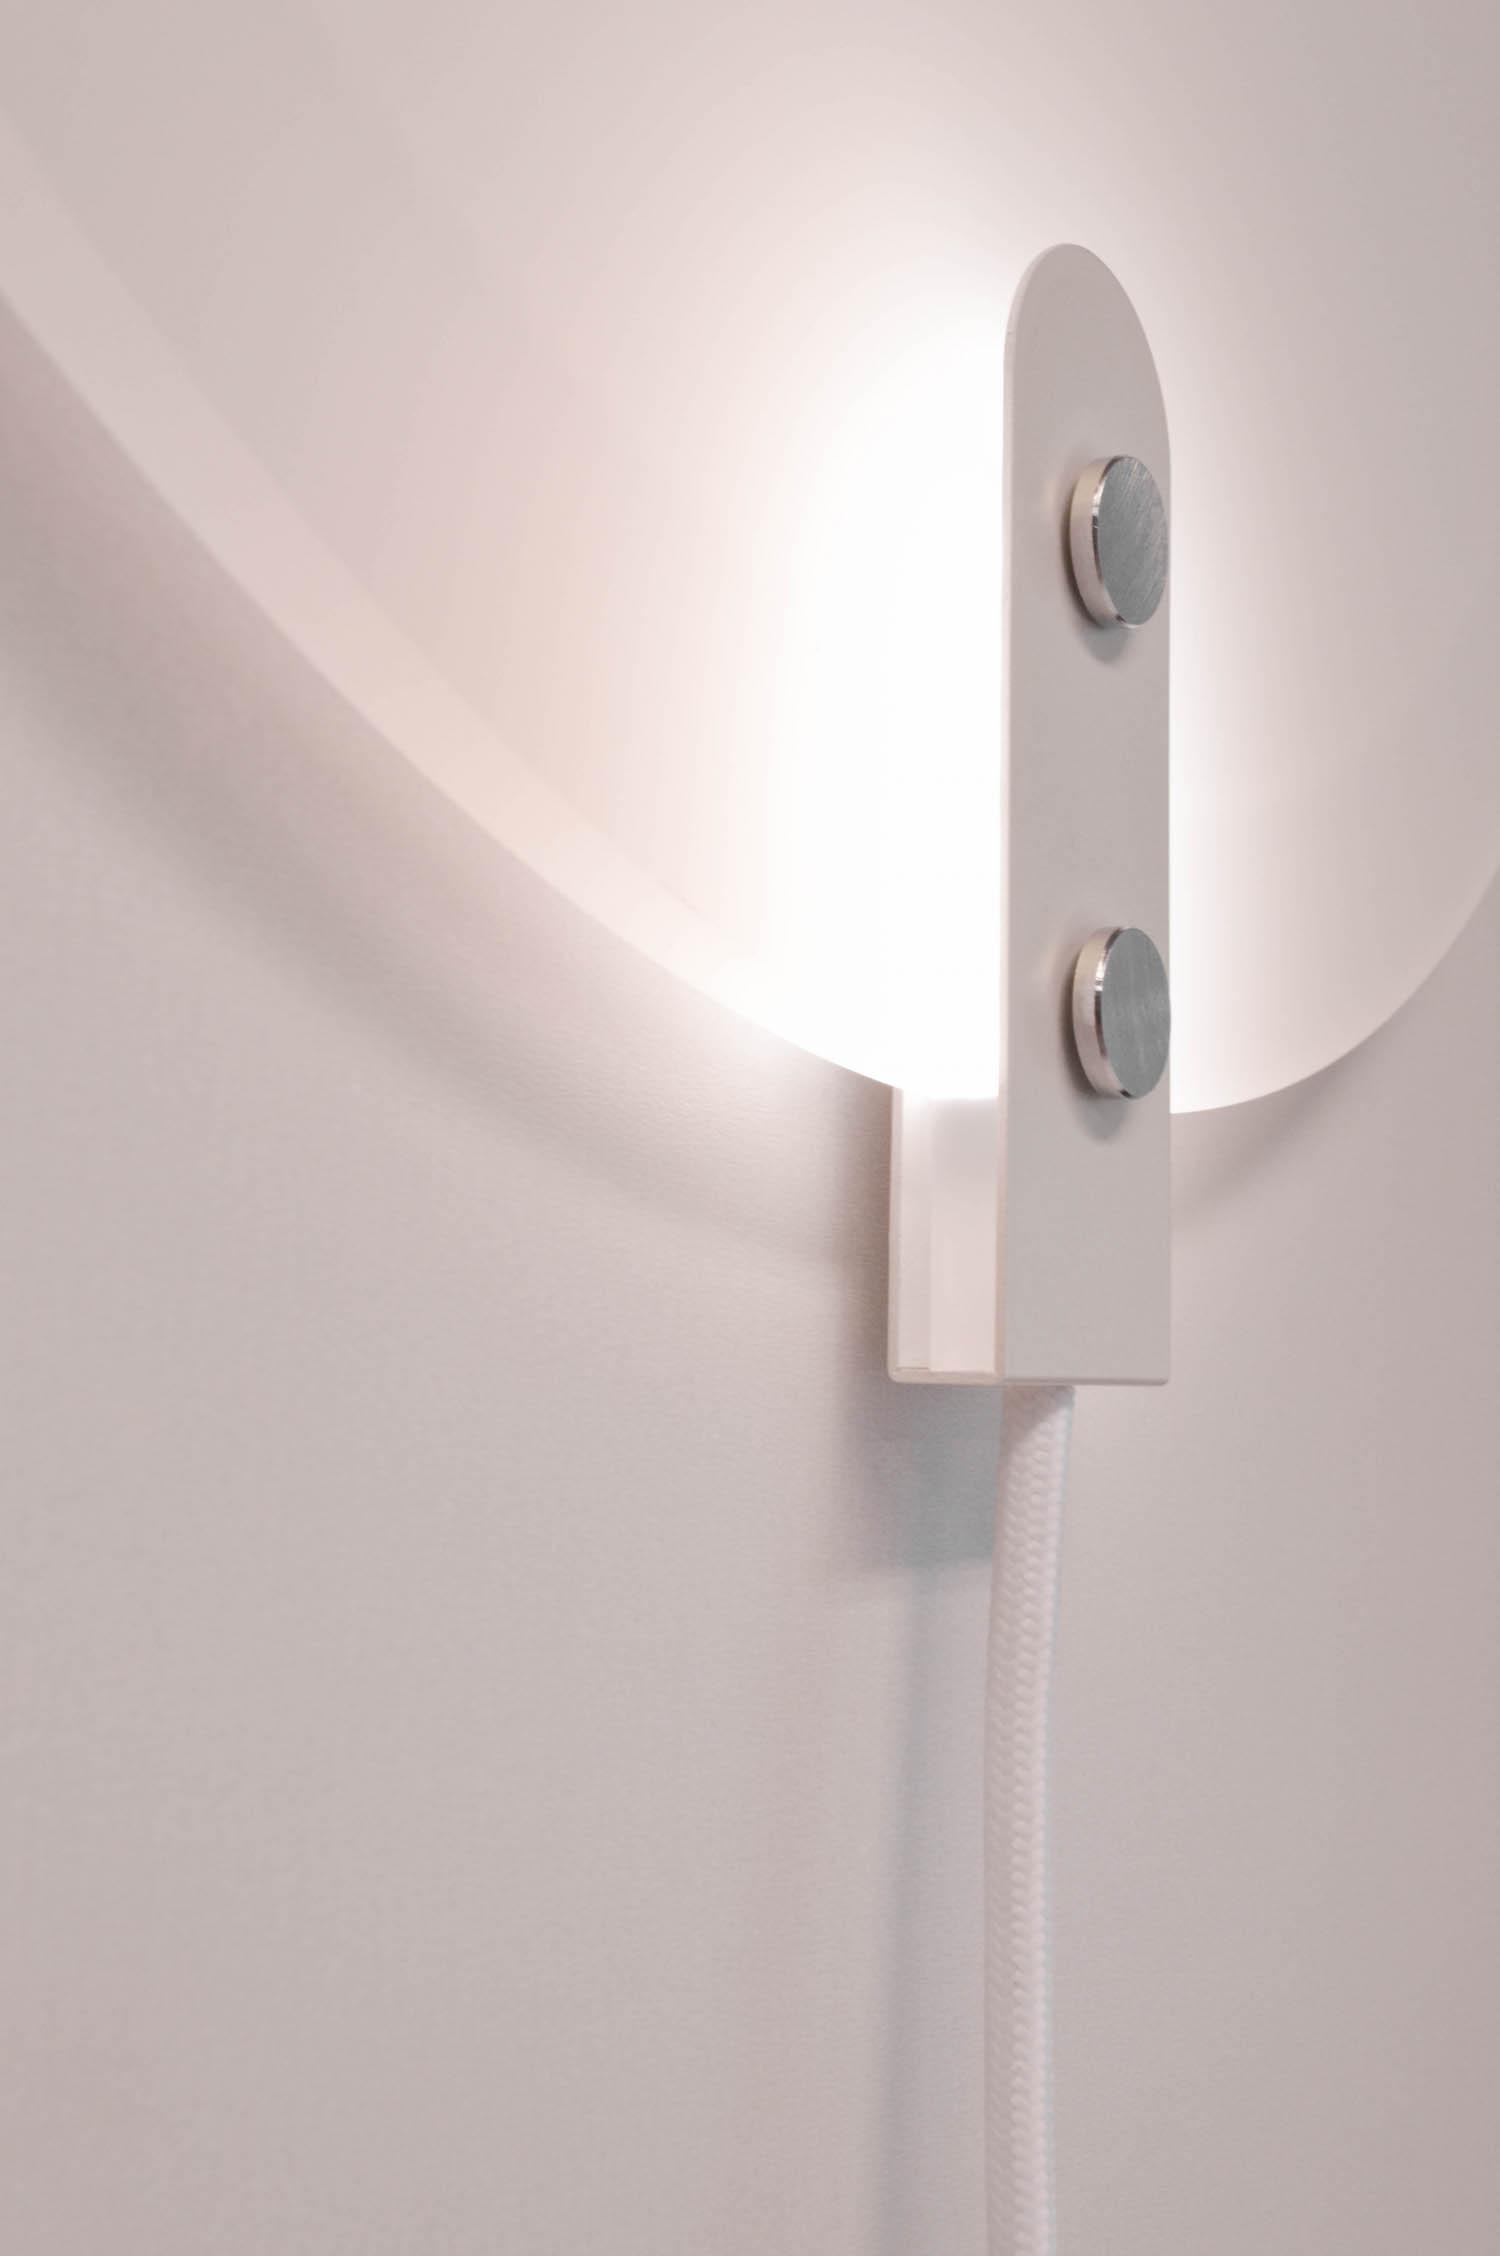 design_studio_fabian_zeijler-designs_lamps_sun_gazing_02